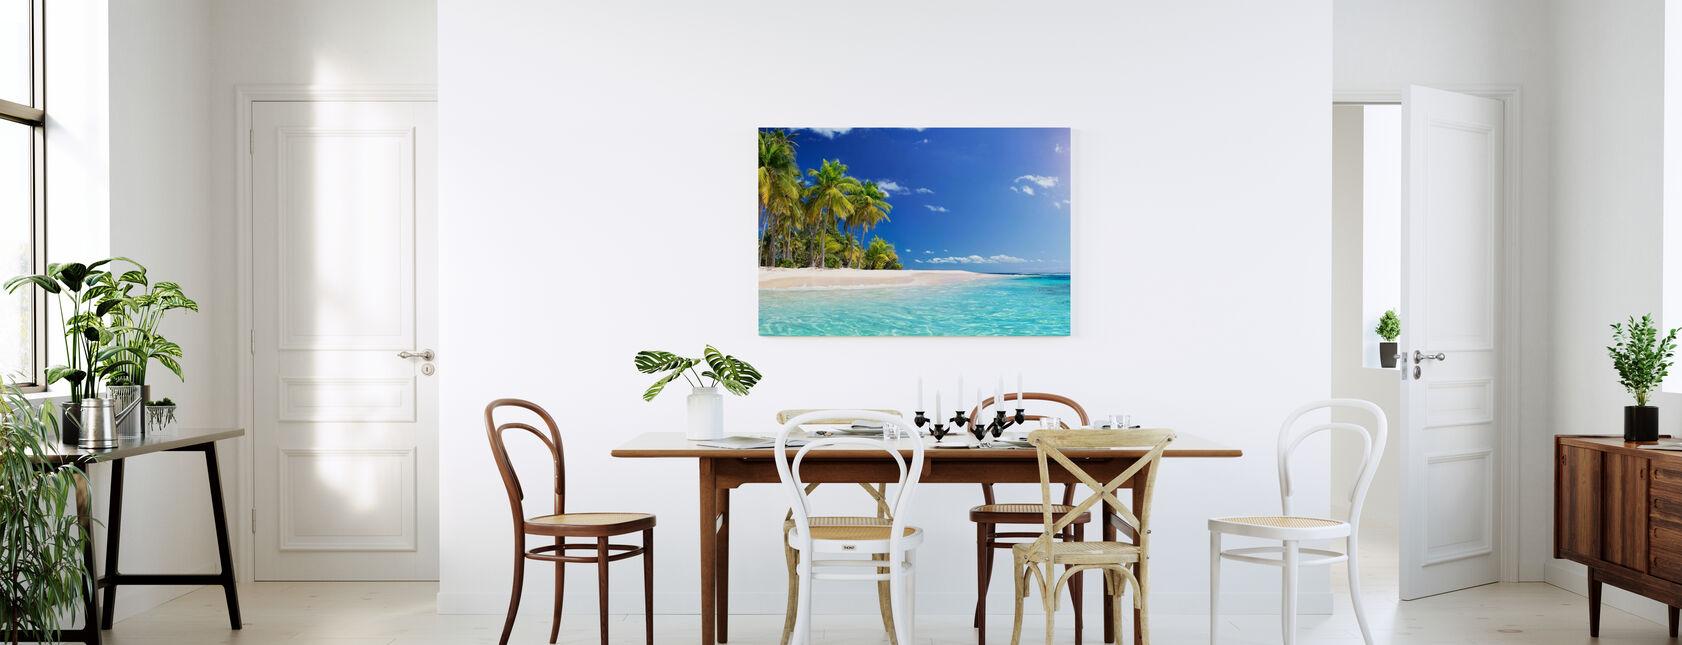 Palm Tree Beach - Canvastaulu - Keittiö